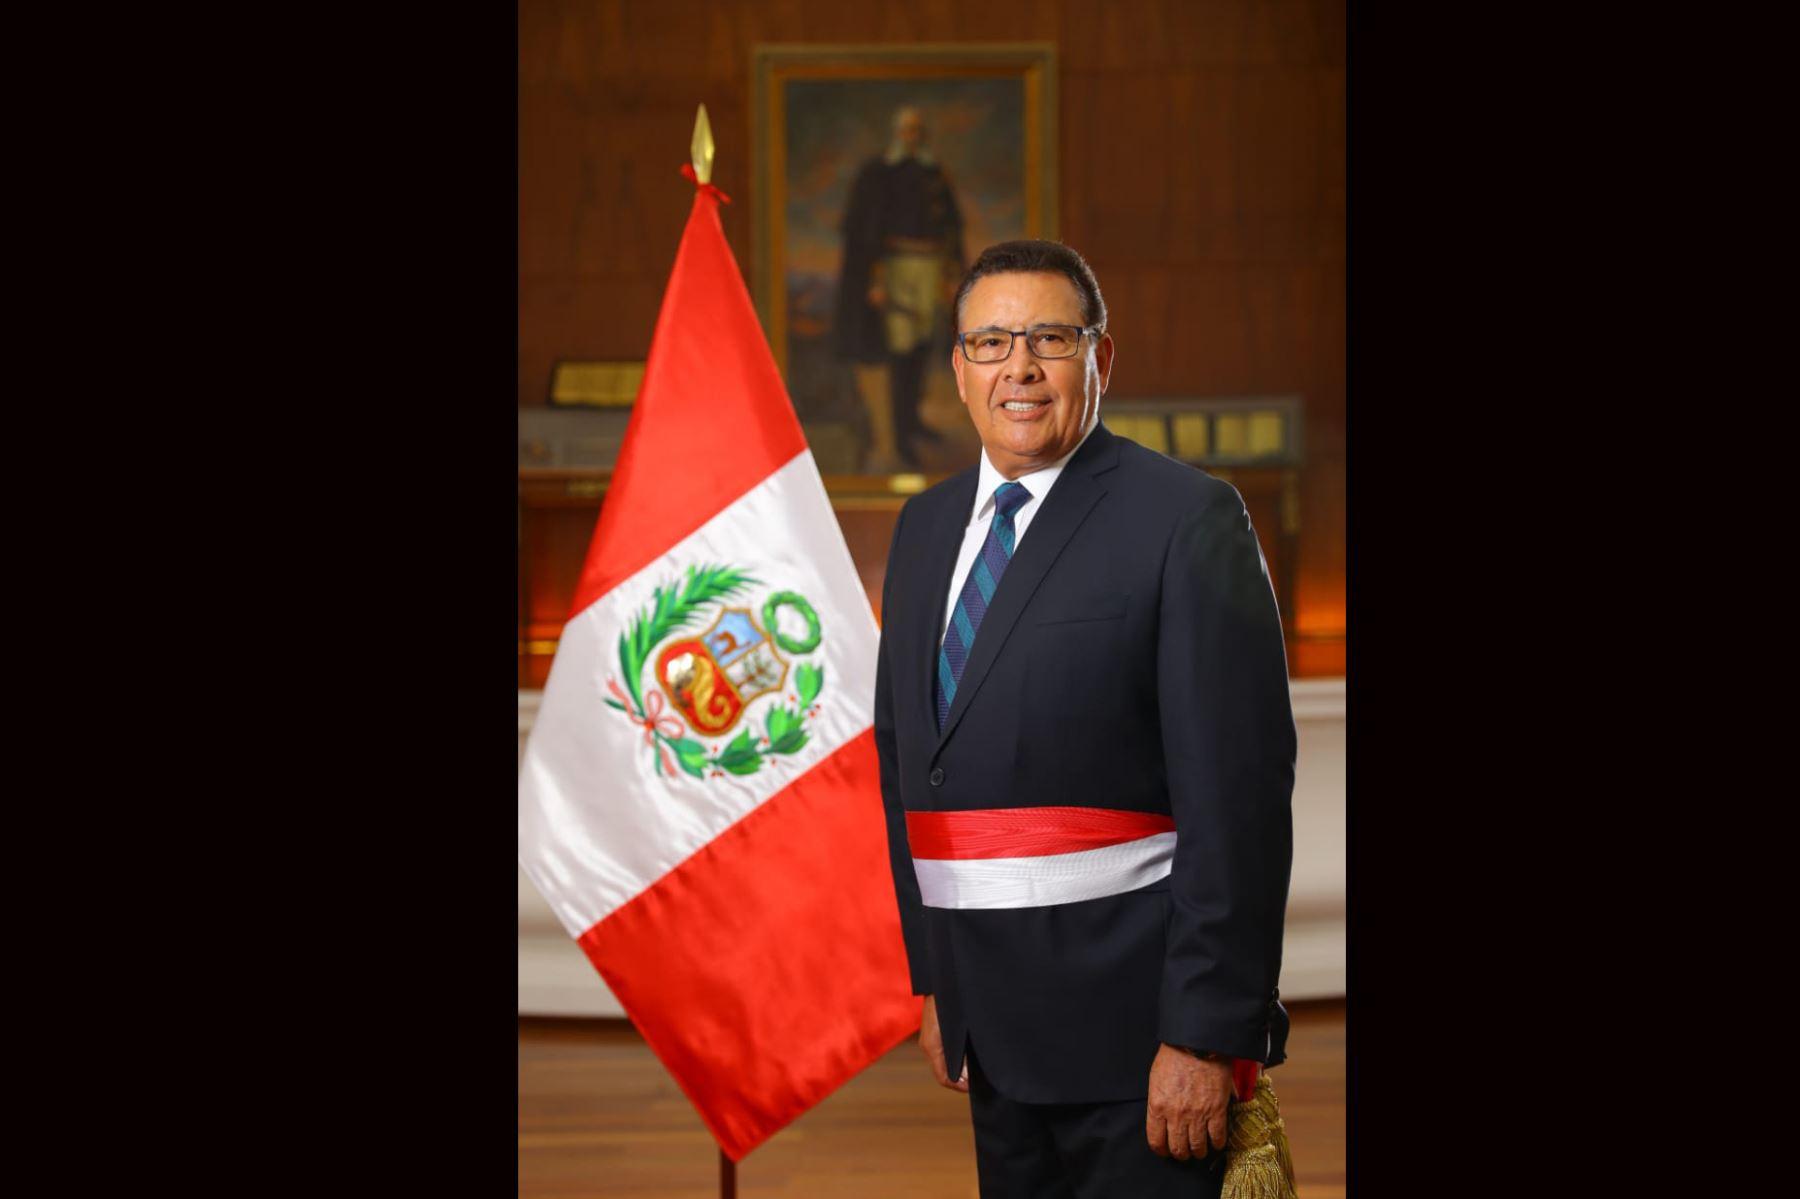 Ministerio de Defensa General (r) José Modesto Huerta Torres  Foto: ANDINA/ Prensa Presidencia